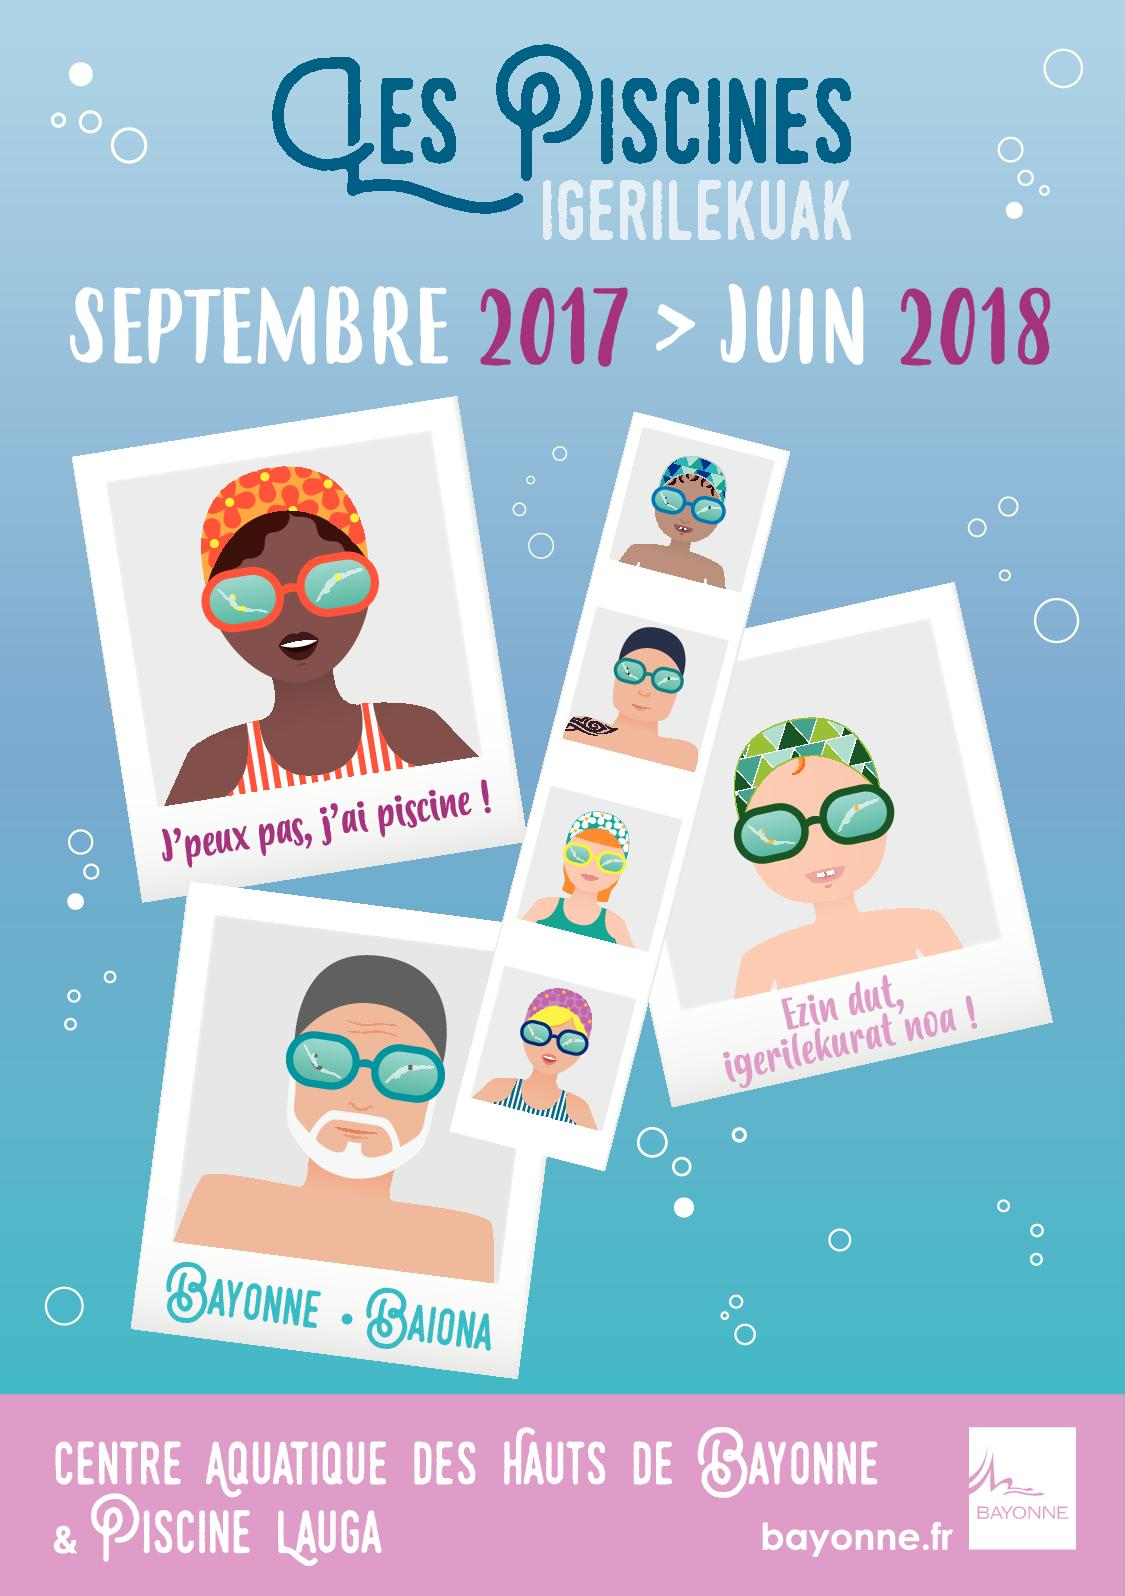 Calam o piscines de bayonne 2017 2018 - Horaire piscine bayonne ...